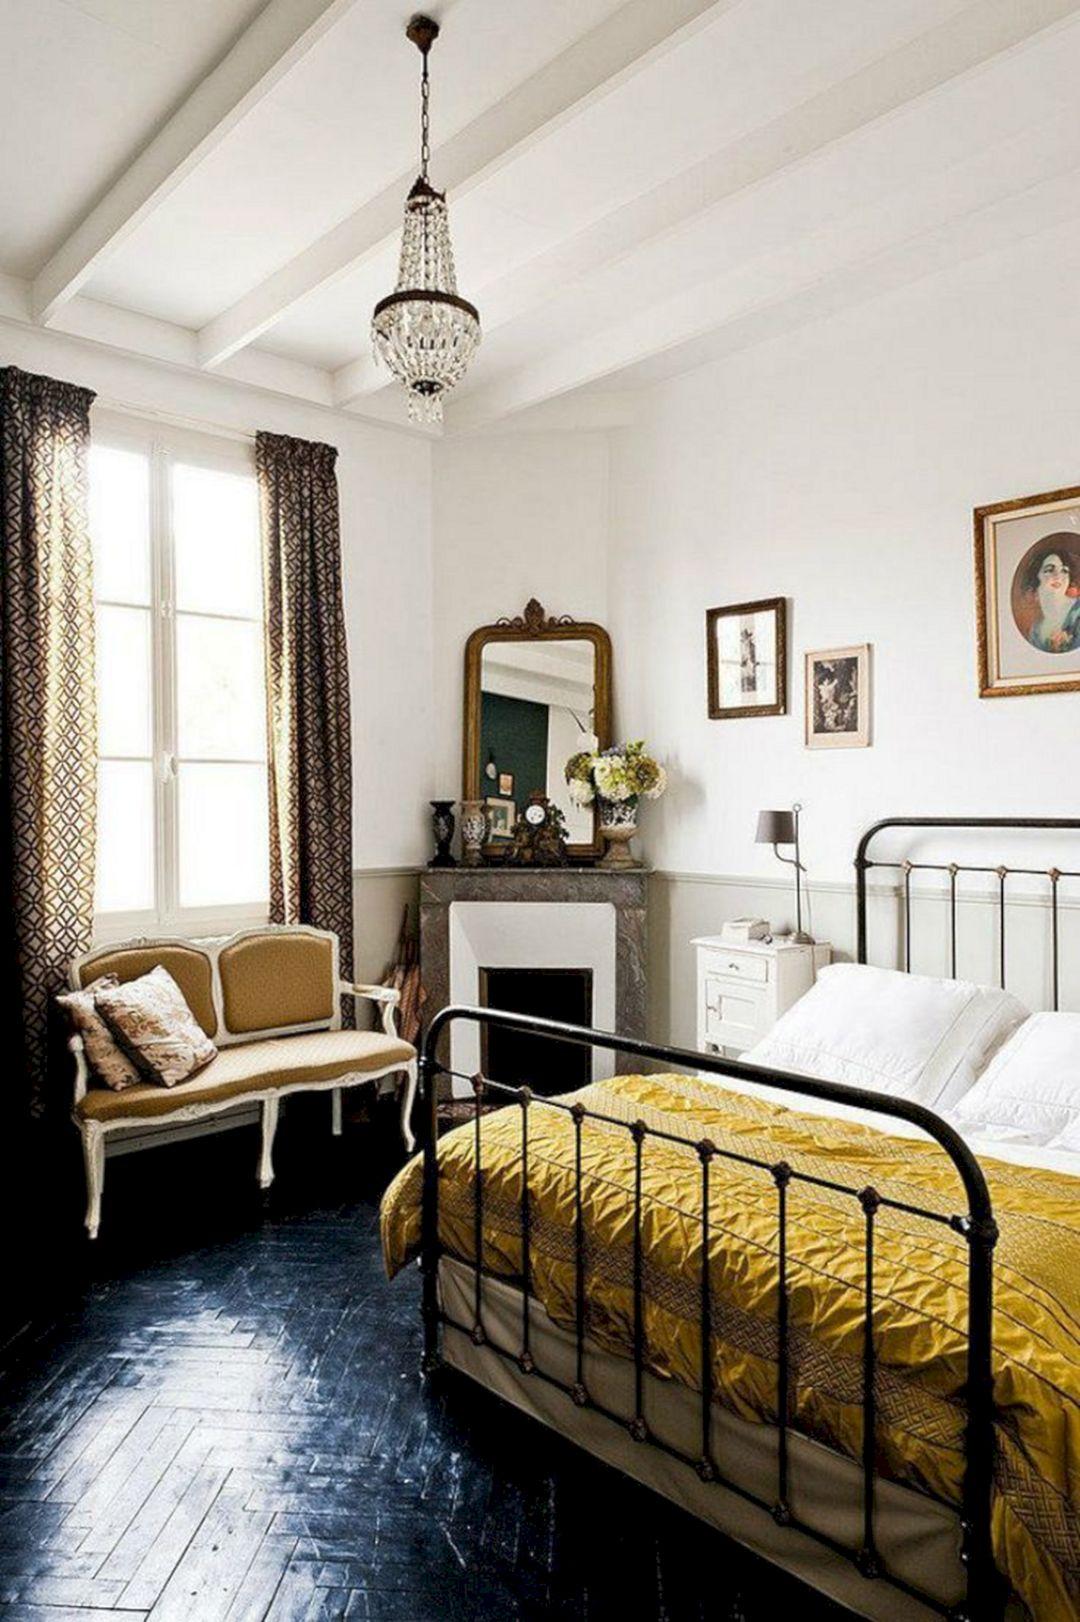 Incredible Yellow Aesthetic Bedroom Decorating Ideas 22 Decoredo